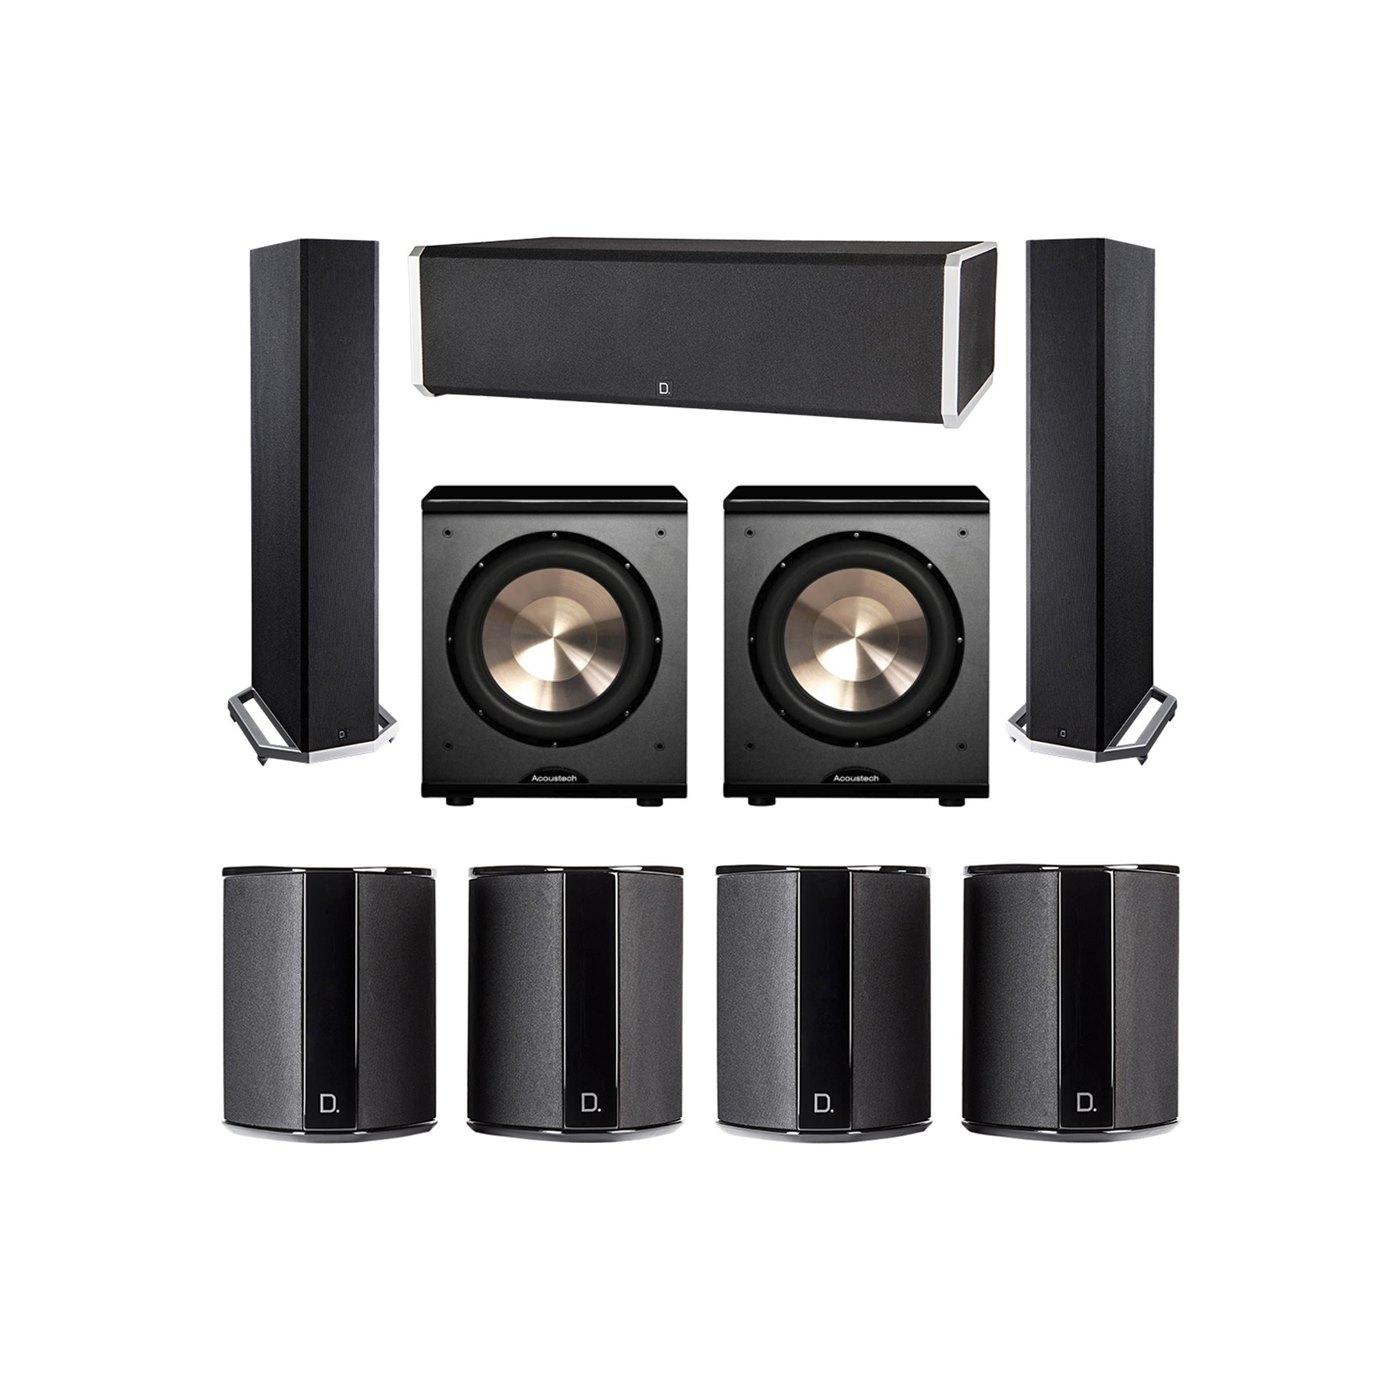 Definitive Technology 7.2 System with 2 BP9020 Tower Speakers, 1 CS9060 Center Channel Speaker, 4 SR9040 Surround Speaker, 2 BIC PL-200 Subwoofer